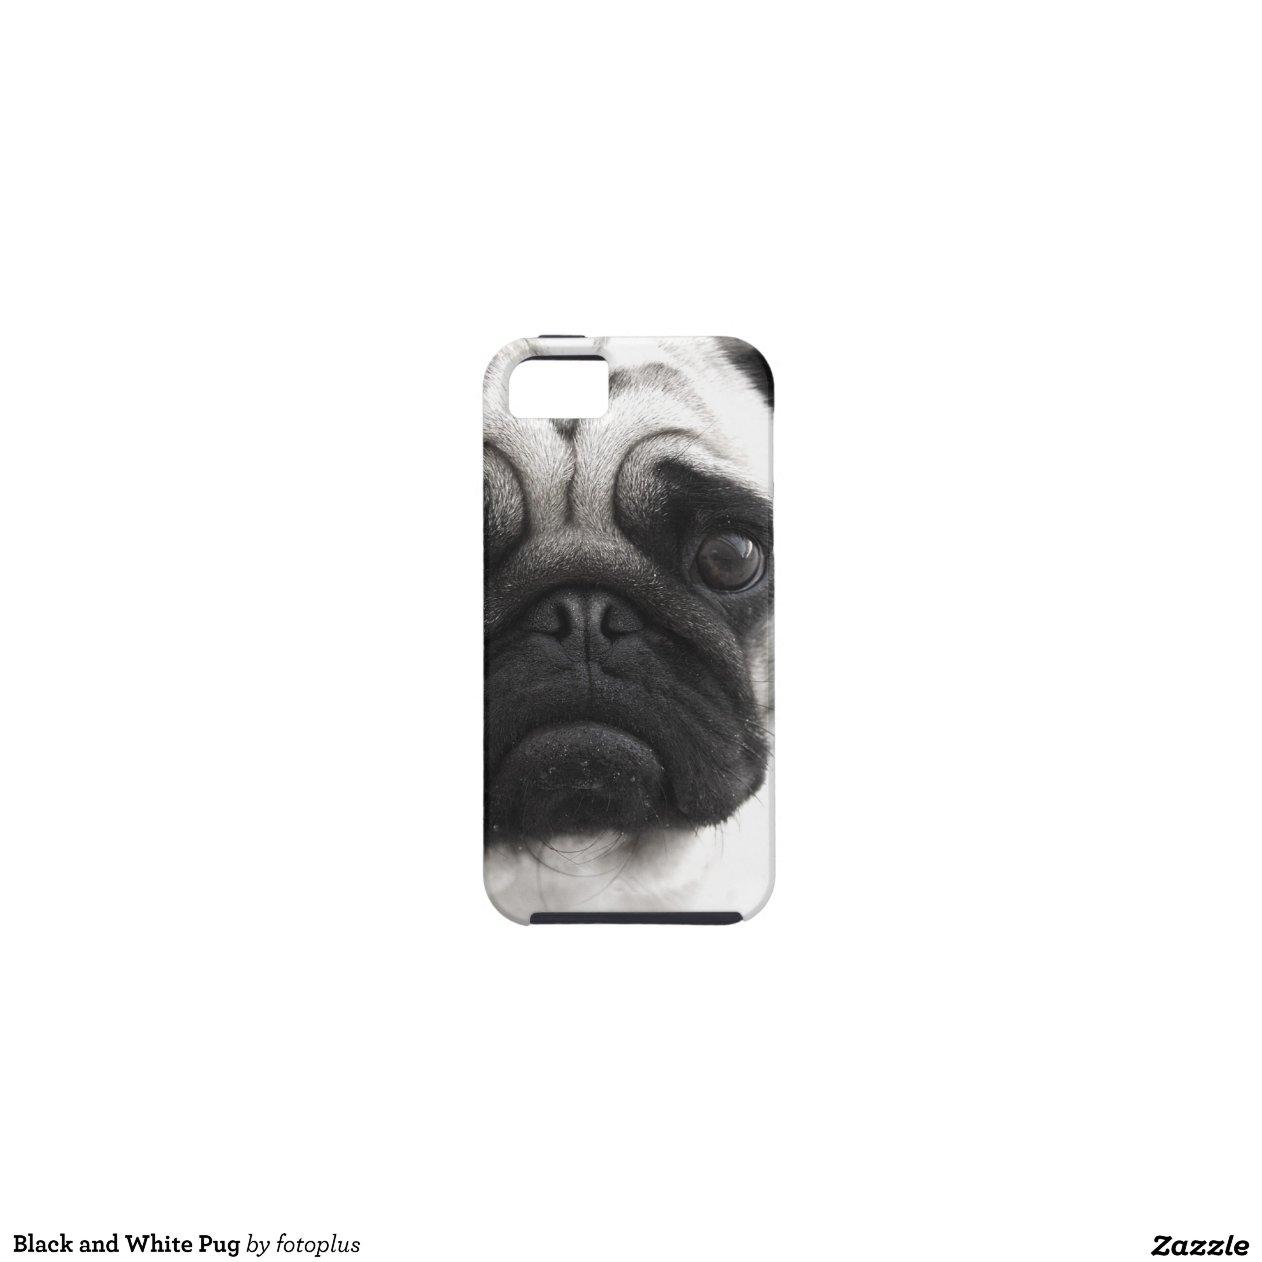 Black And White Pug IPhone 5 Cases Zazzle